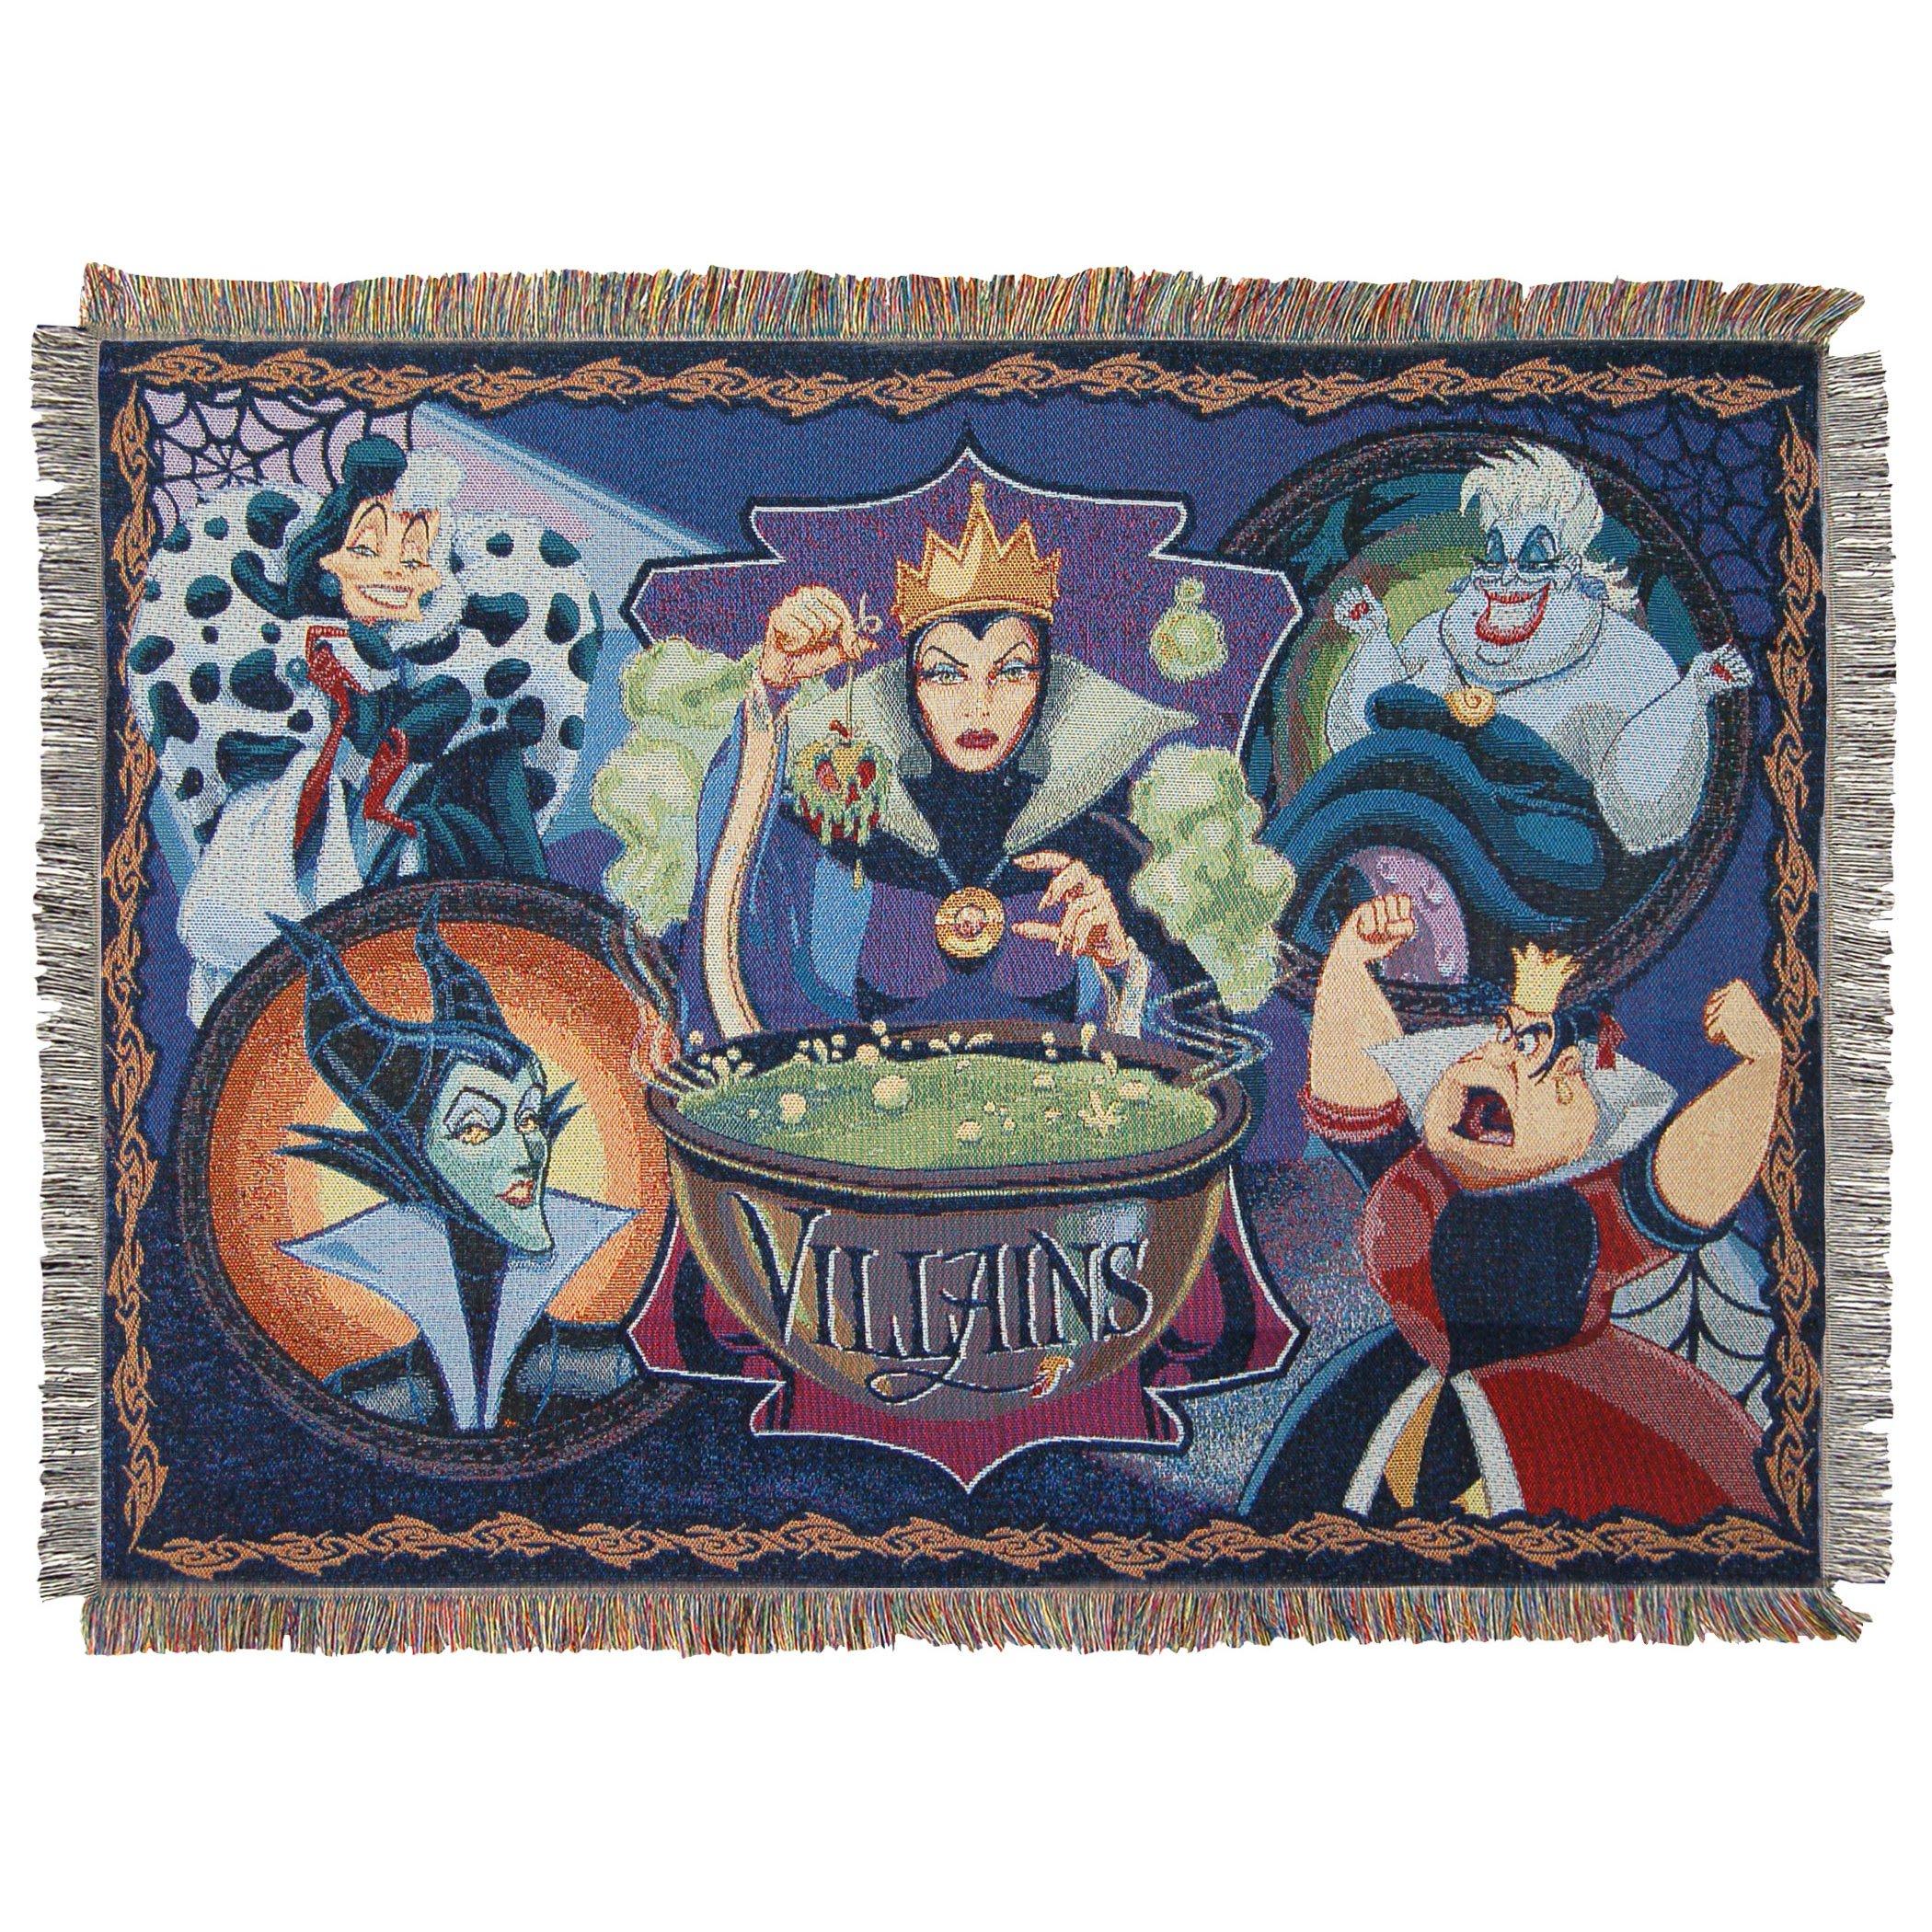 Disney-Pixar's Villains, ''Vile Villains'' Woven Tapestry Throw Blanket, 48'' x 60'', Multi Color by Disney